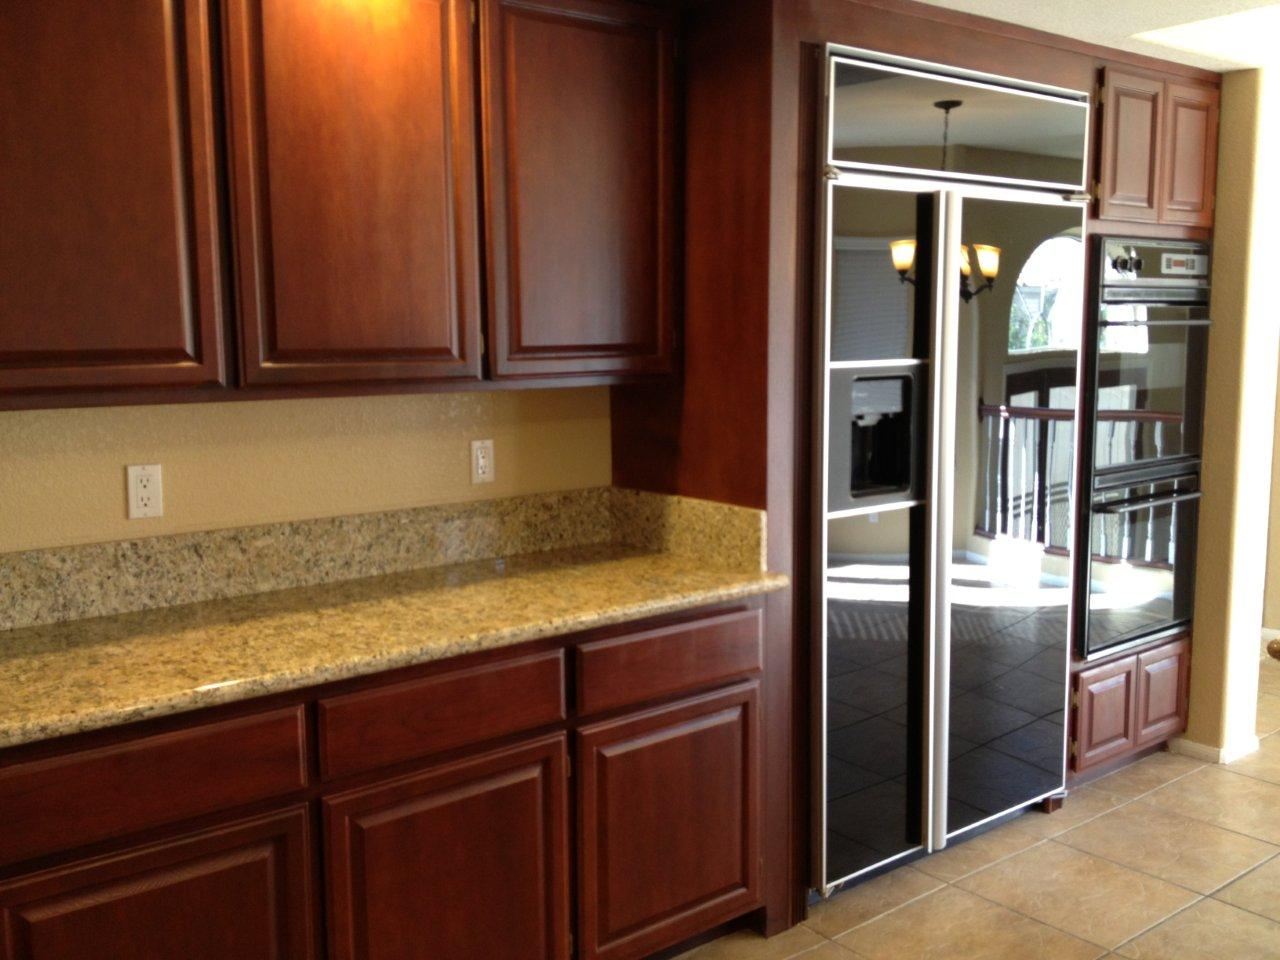 granite kitchen designs pictures photo - 9